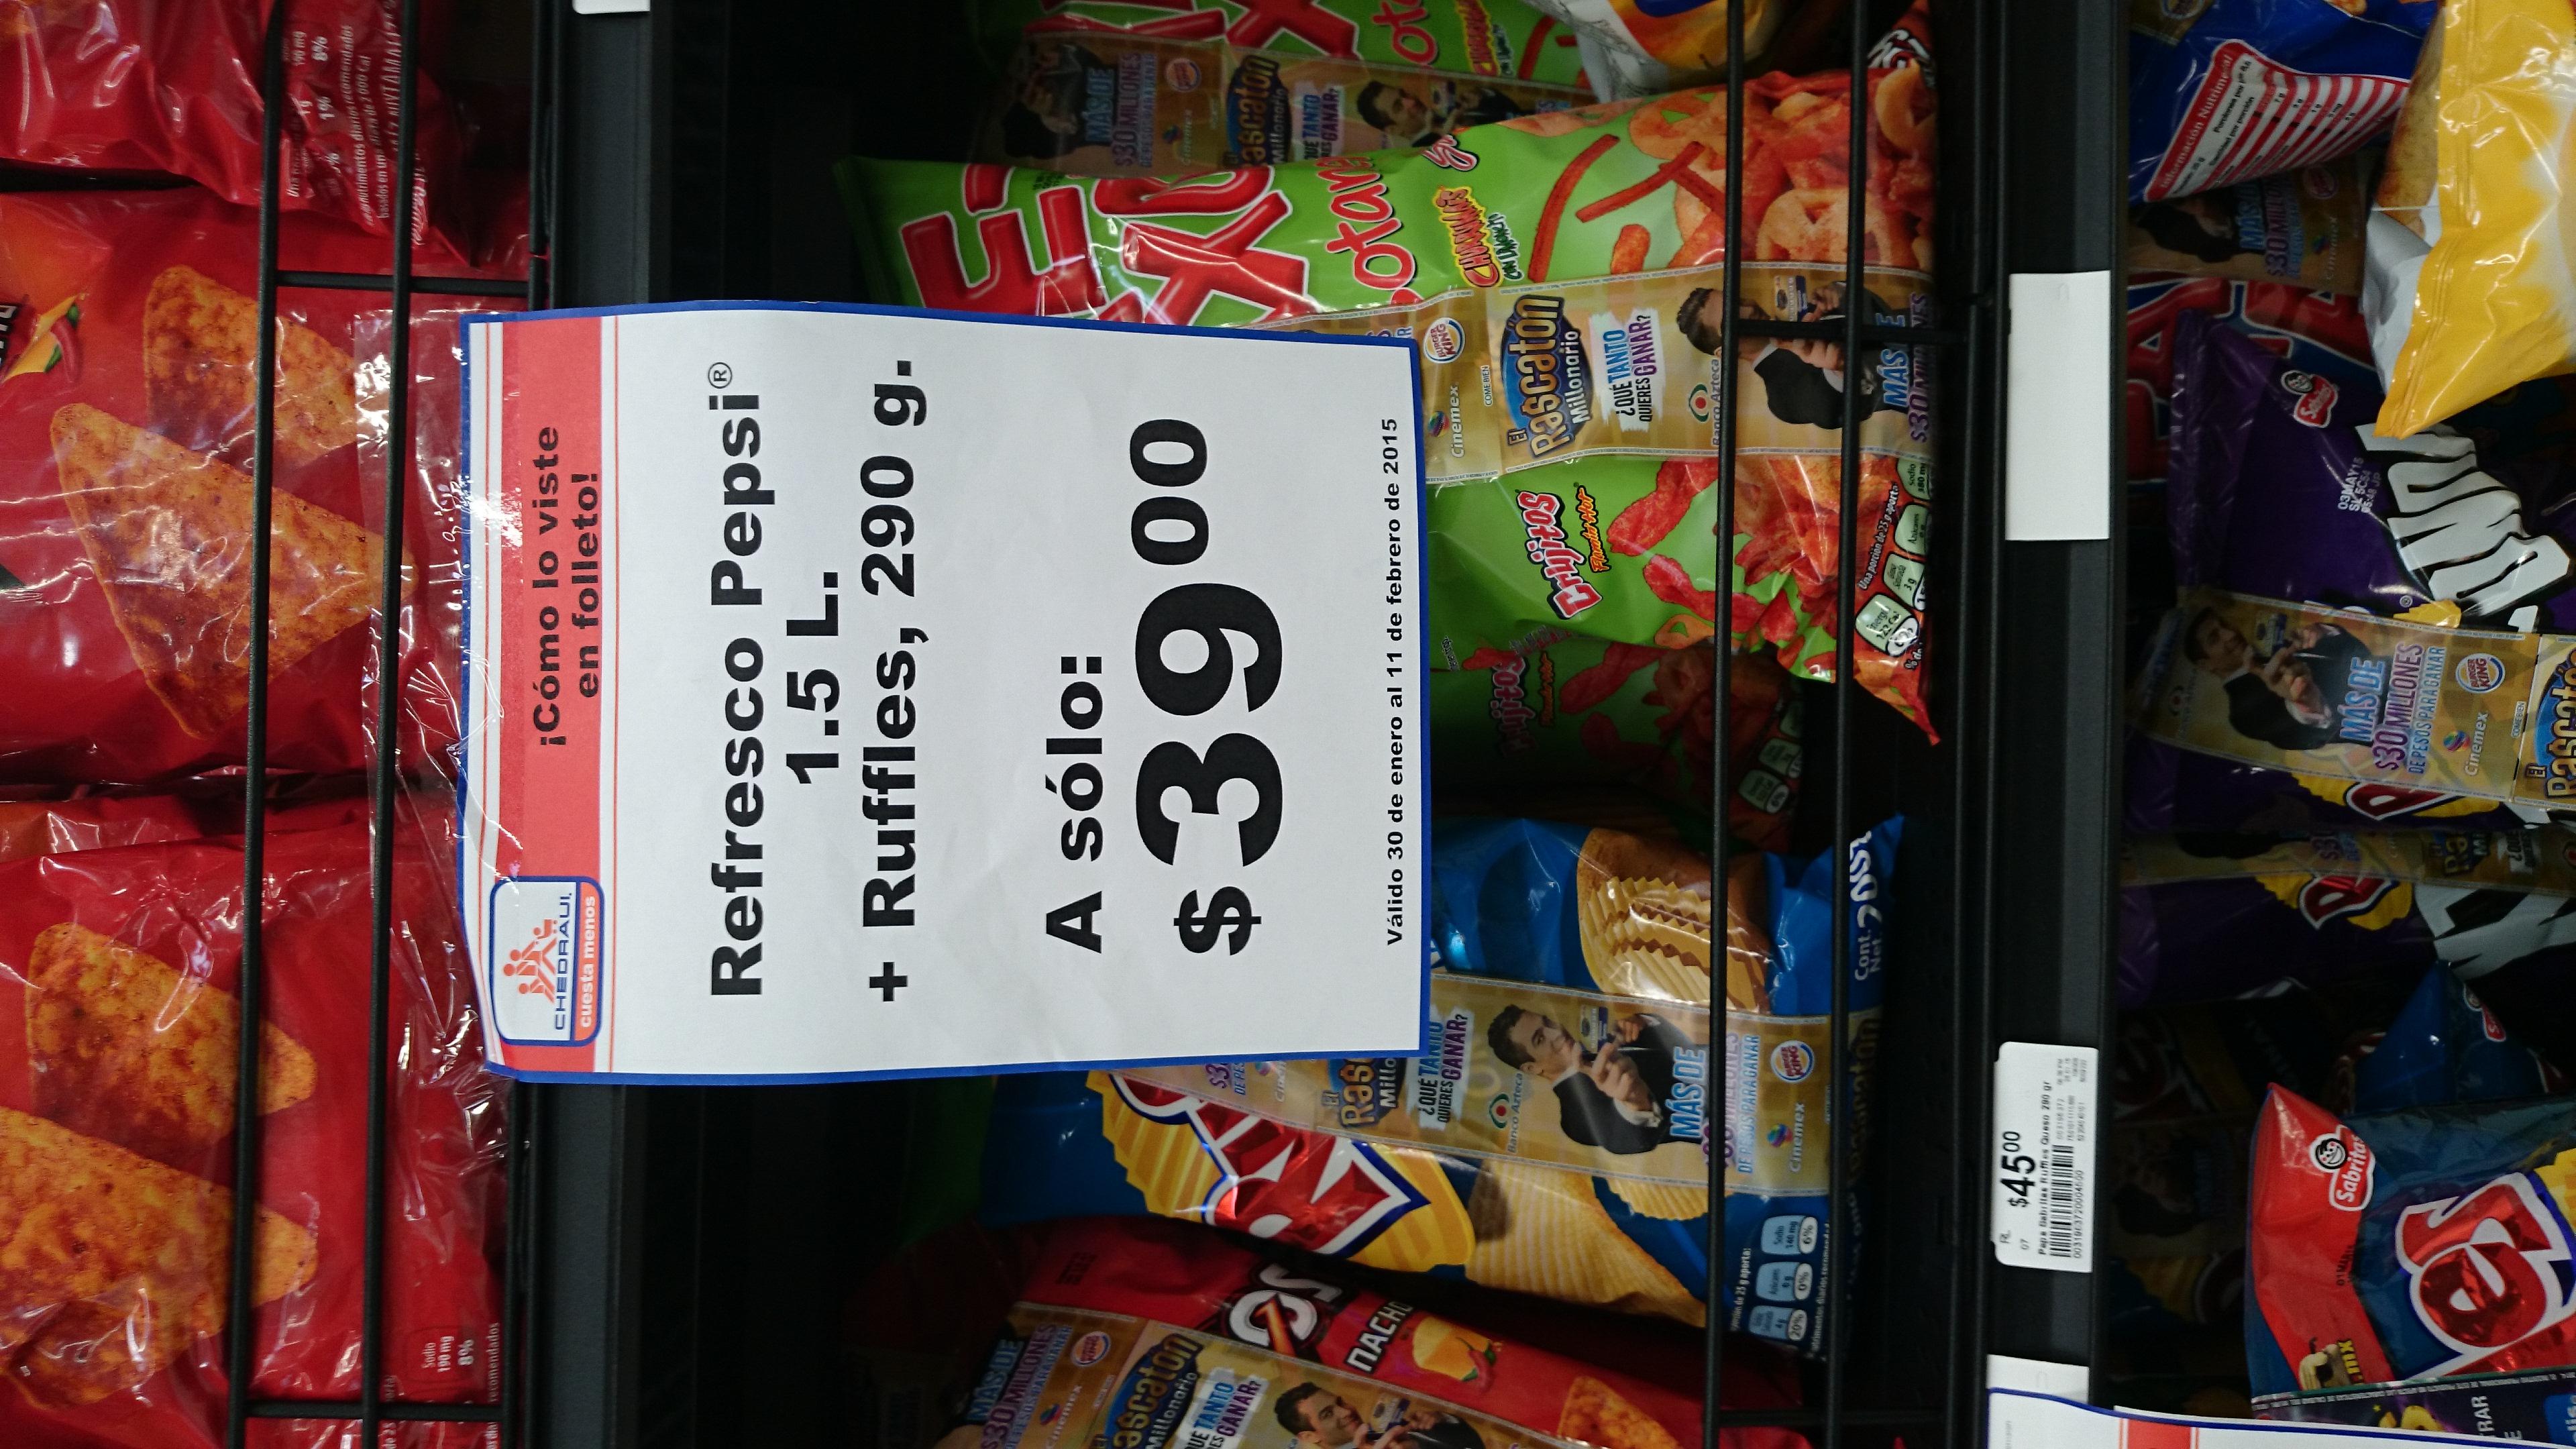 chedraui: papas ruffles de 290 gr + Pepsi de 1.5 lt